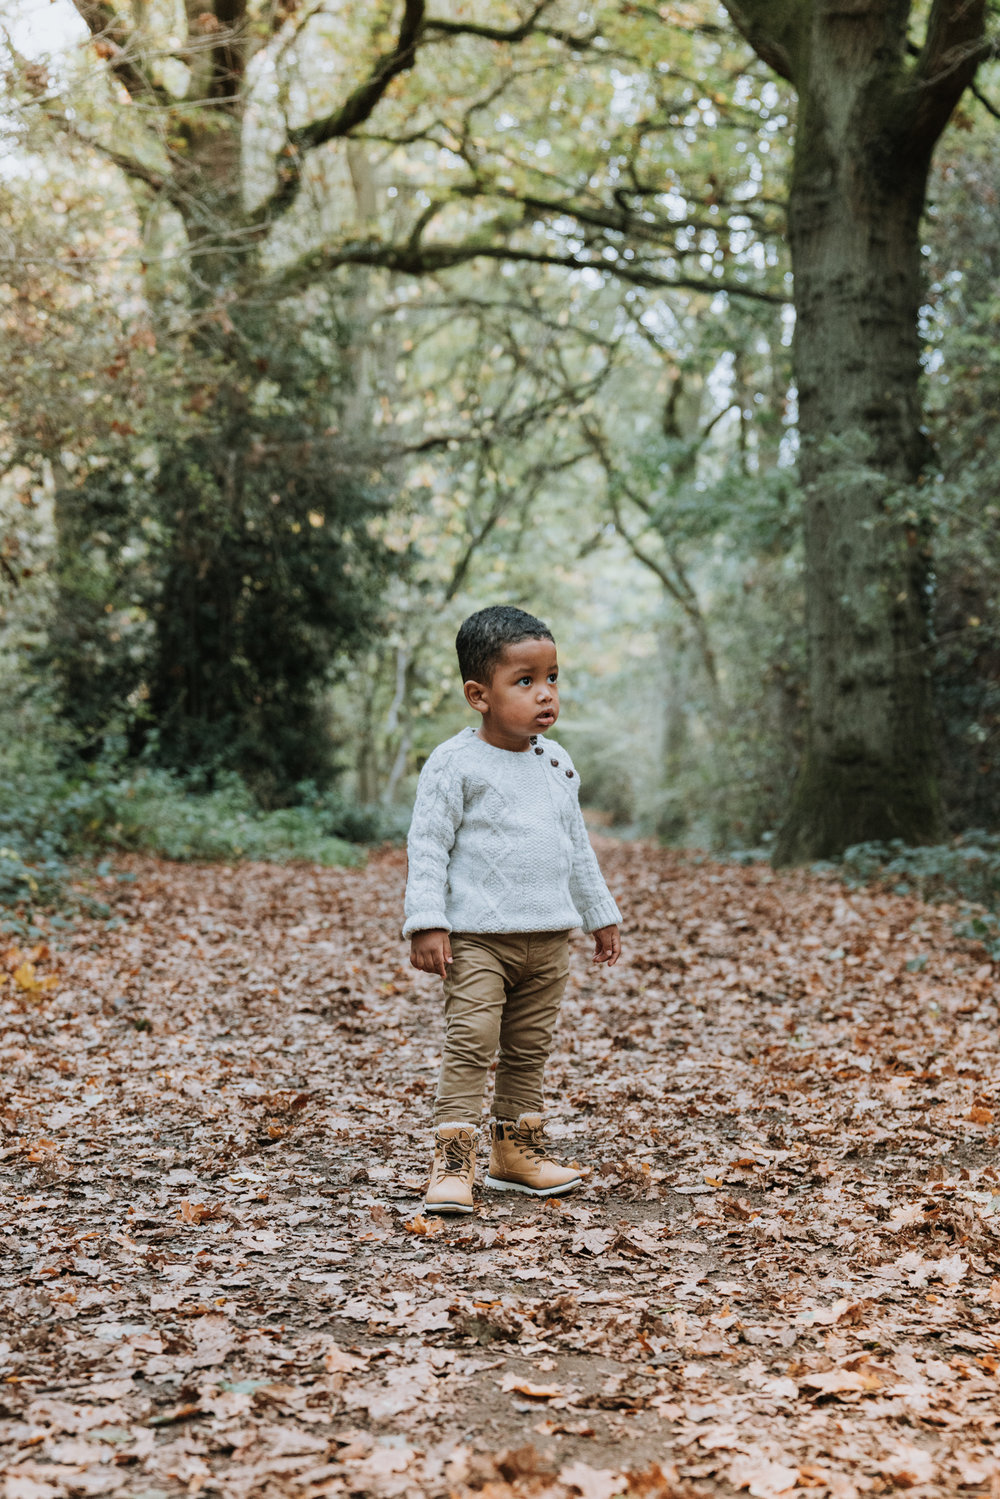 Grace-Elizabeth-Woodland-Family-Photography-Lifestyle-Essex-Norfolk-Suffolk-12.jpg